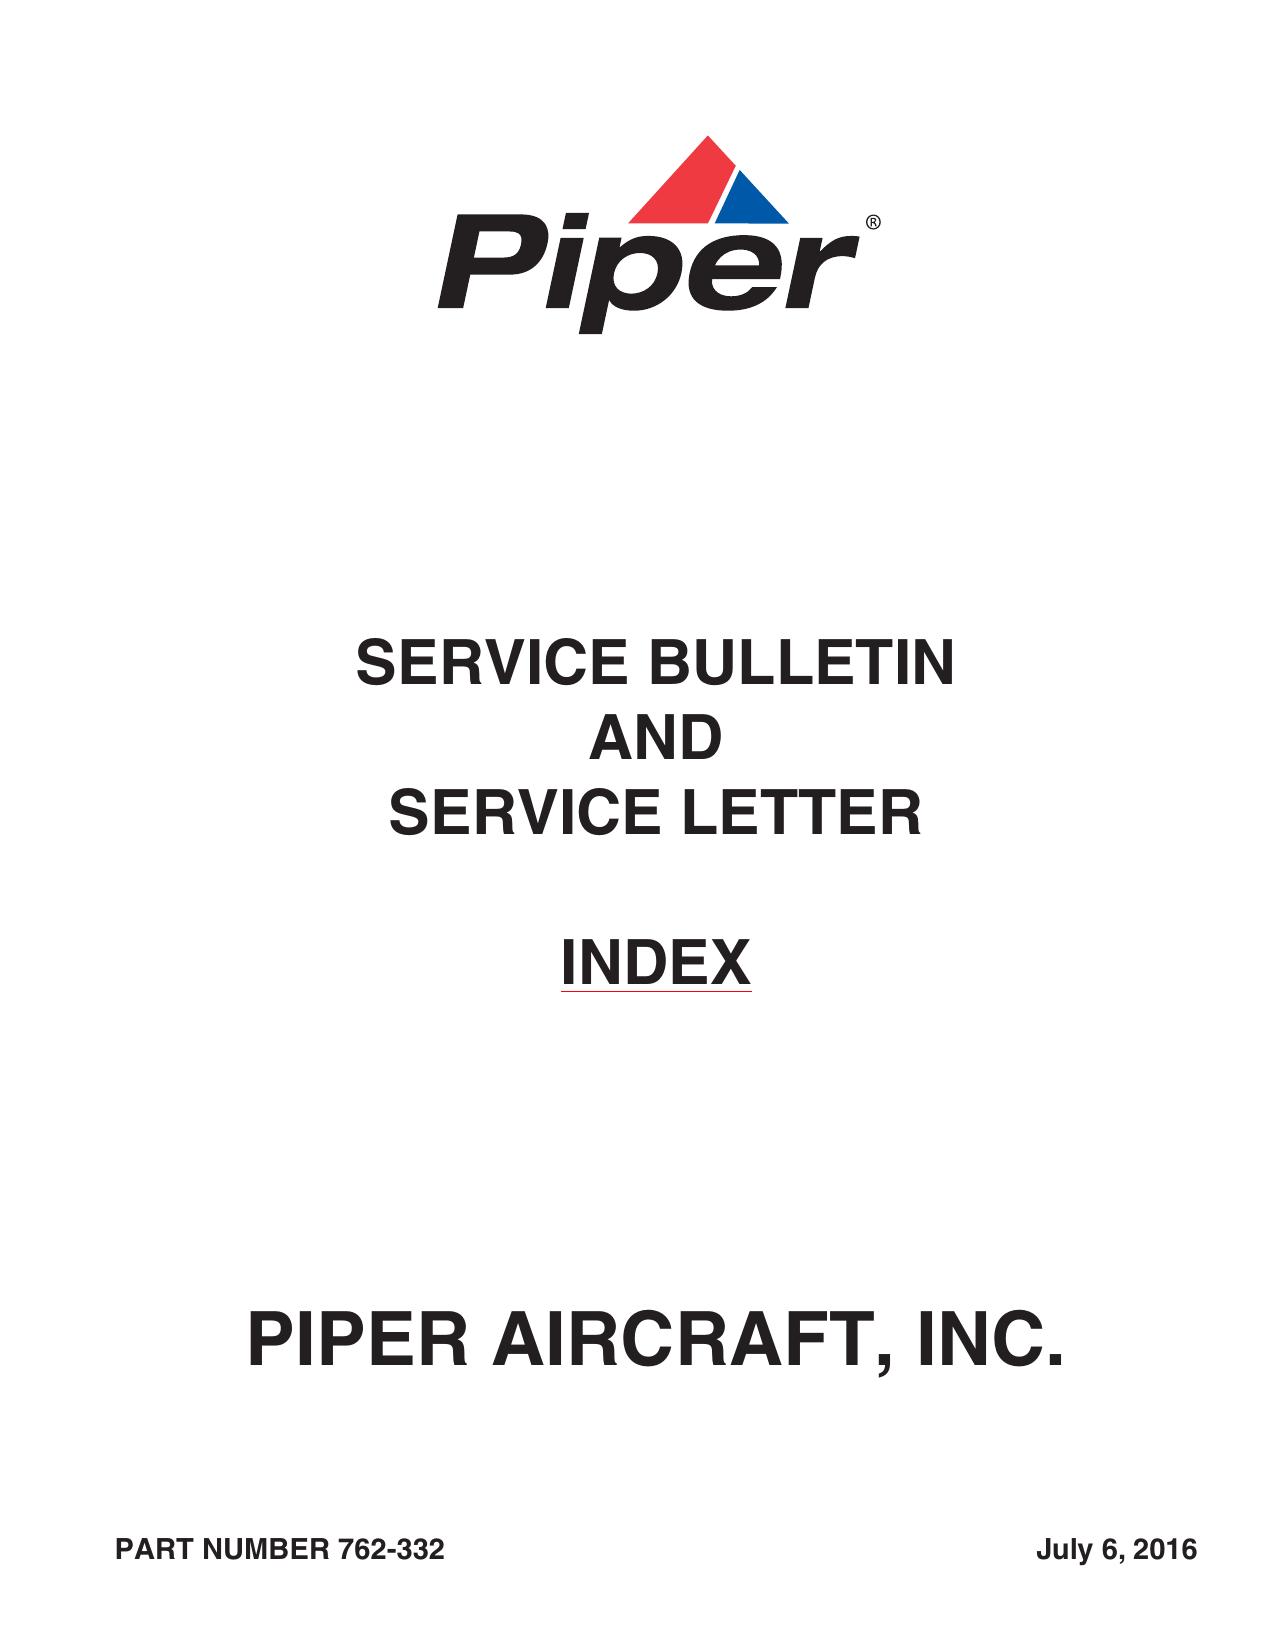 Service Bulletin - Service Letter Index